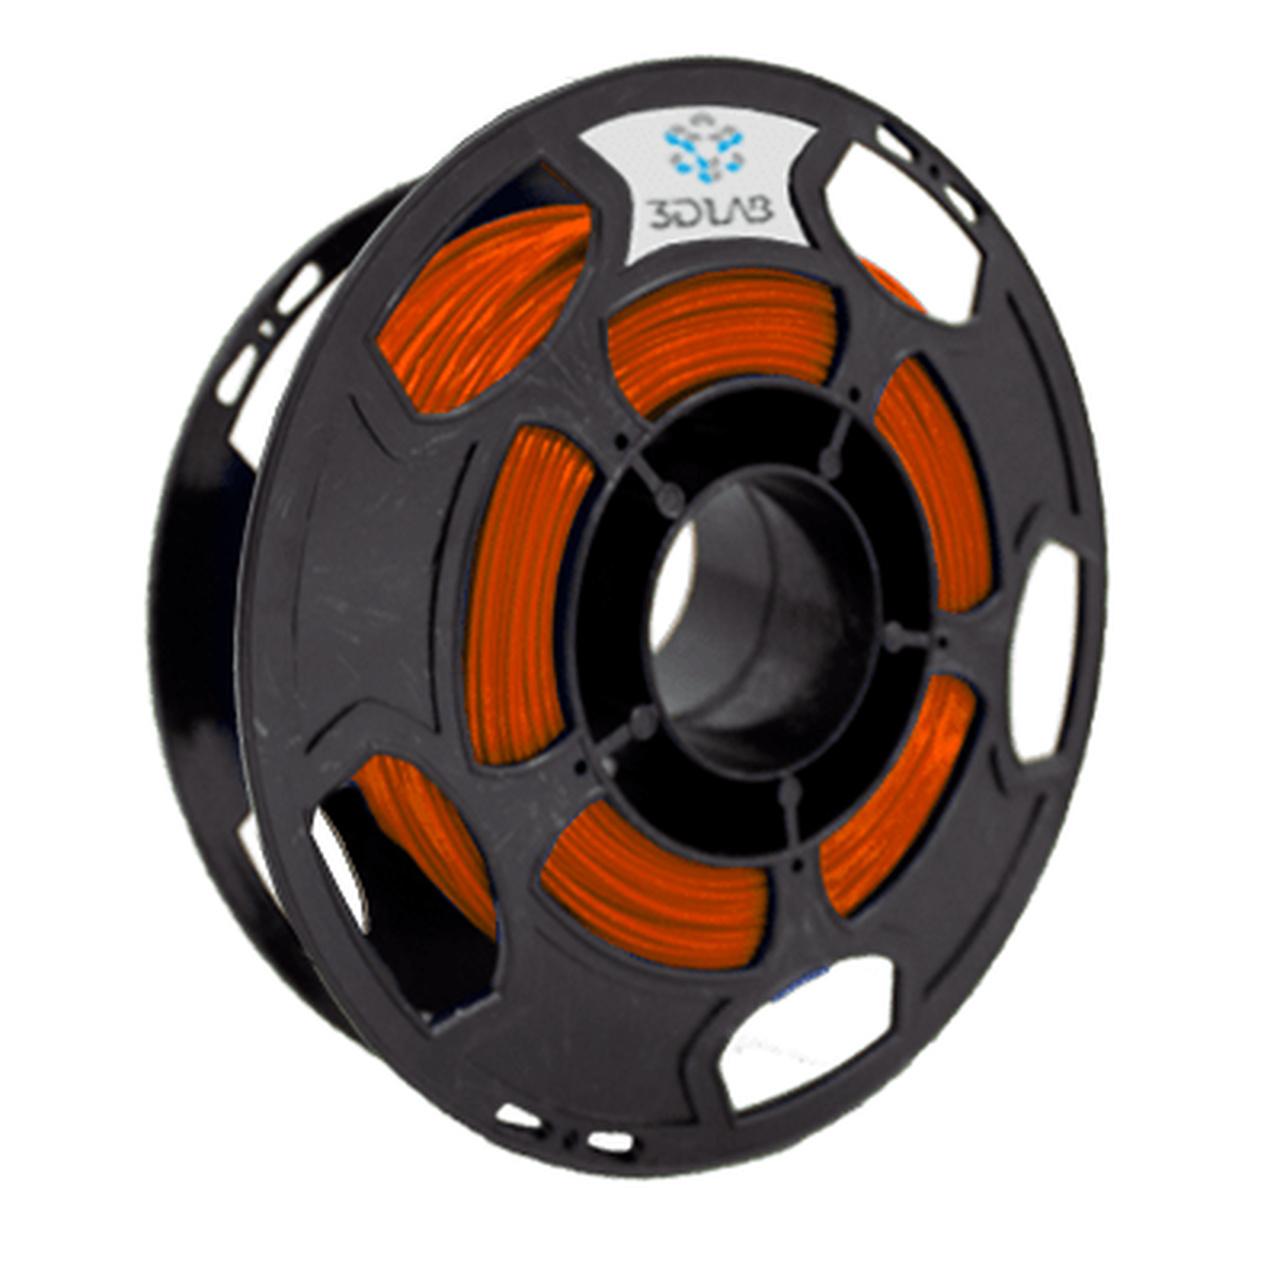 Filamento ABS Premium - Laranja - 3D Lab - 1.75mm - 500g